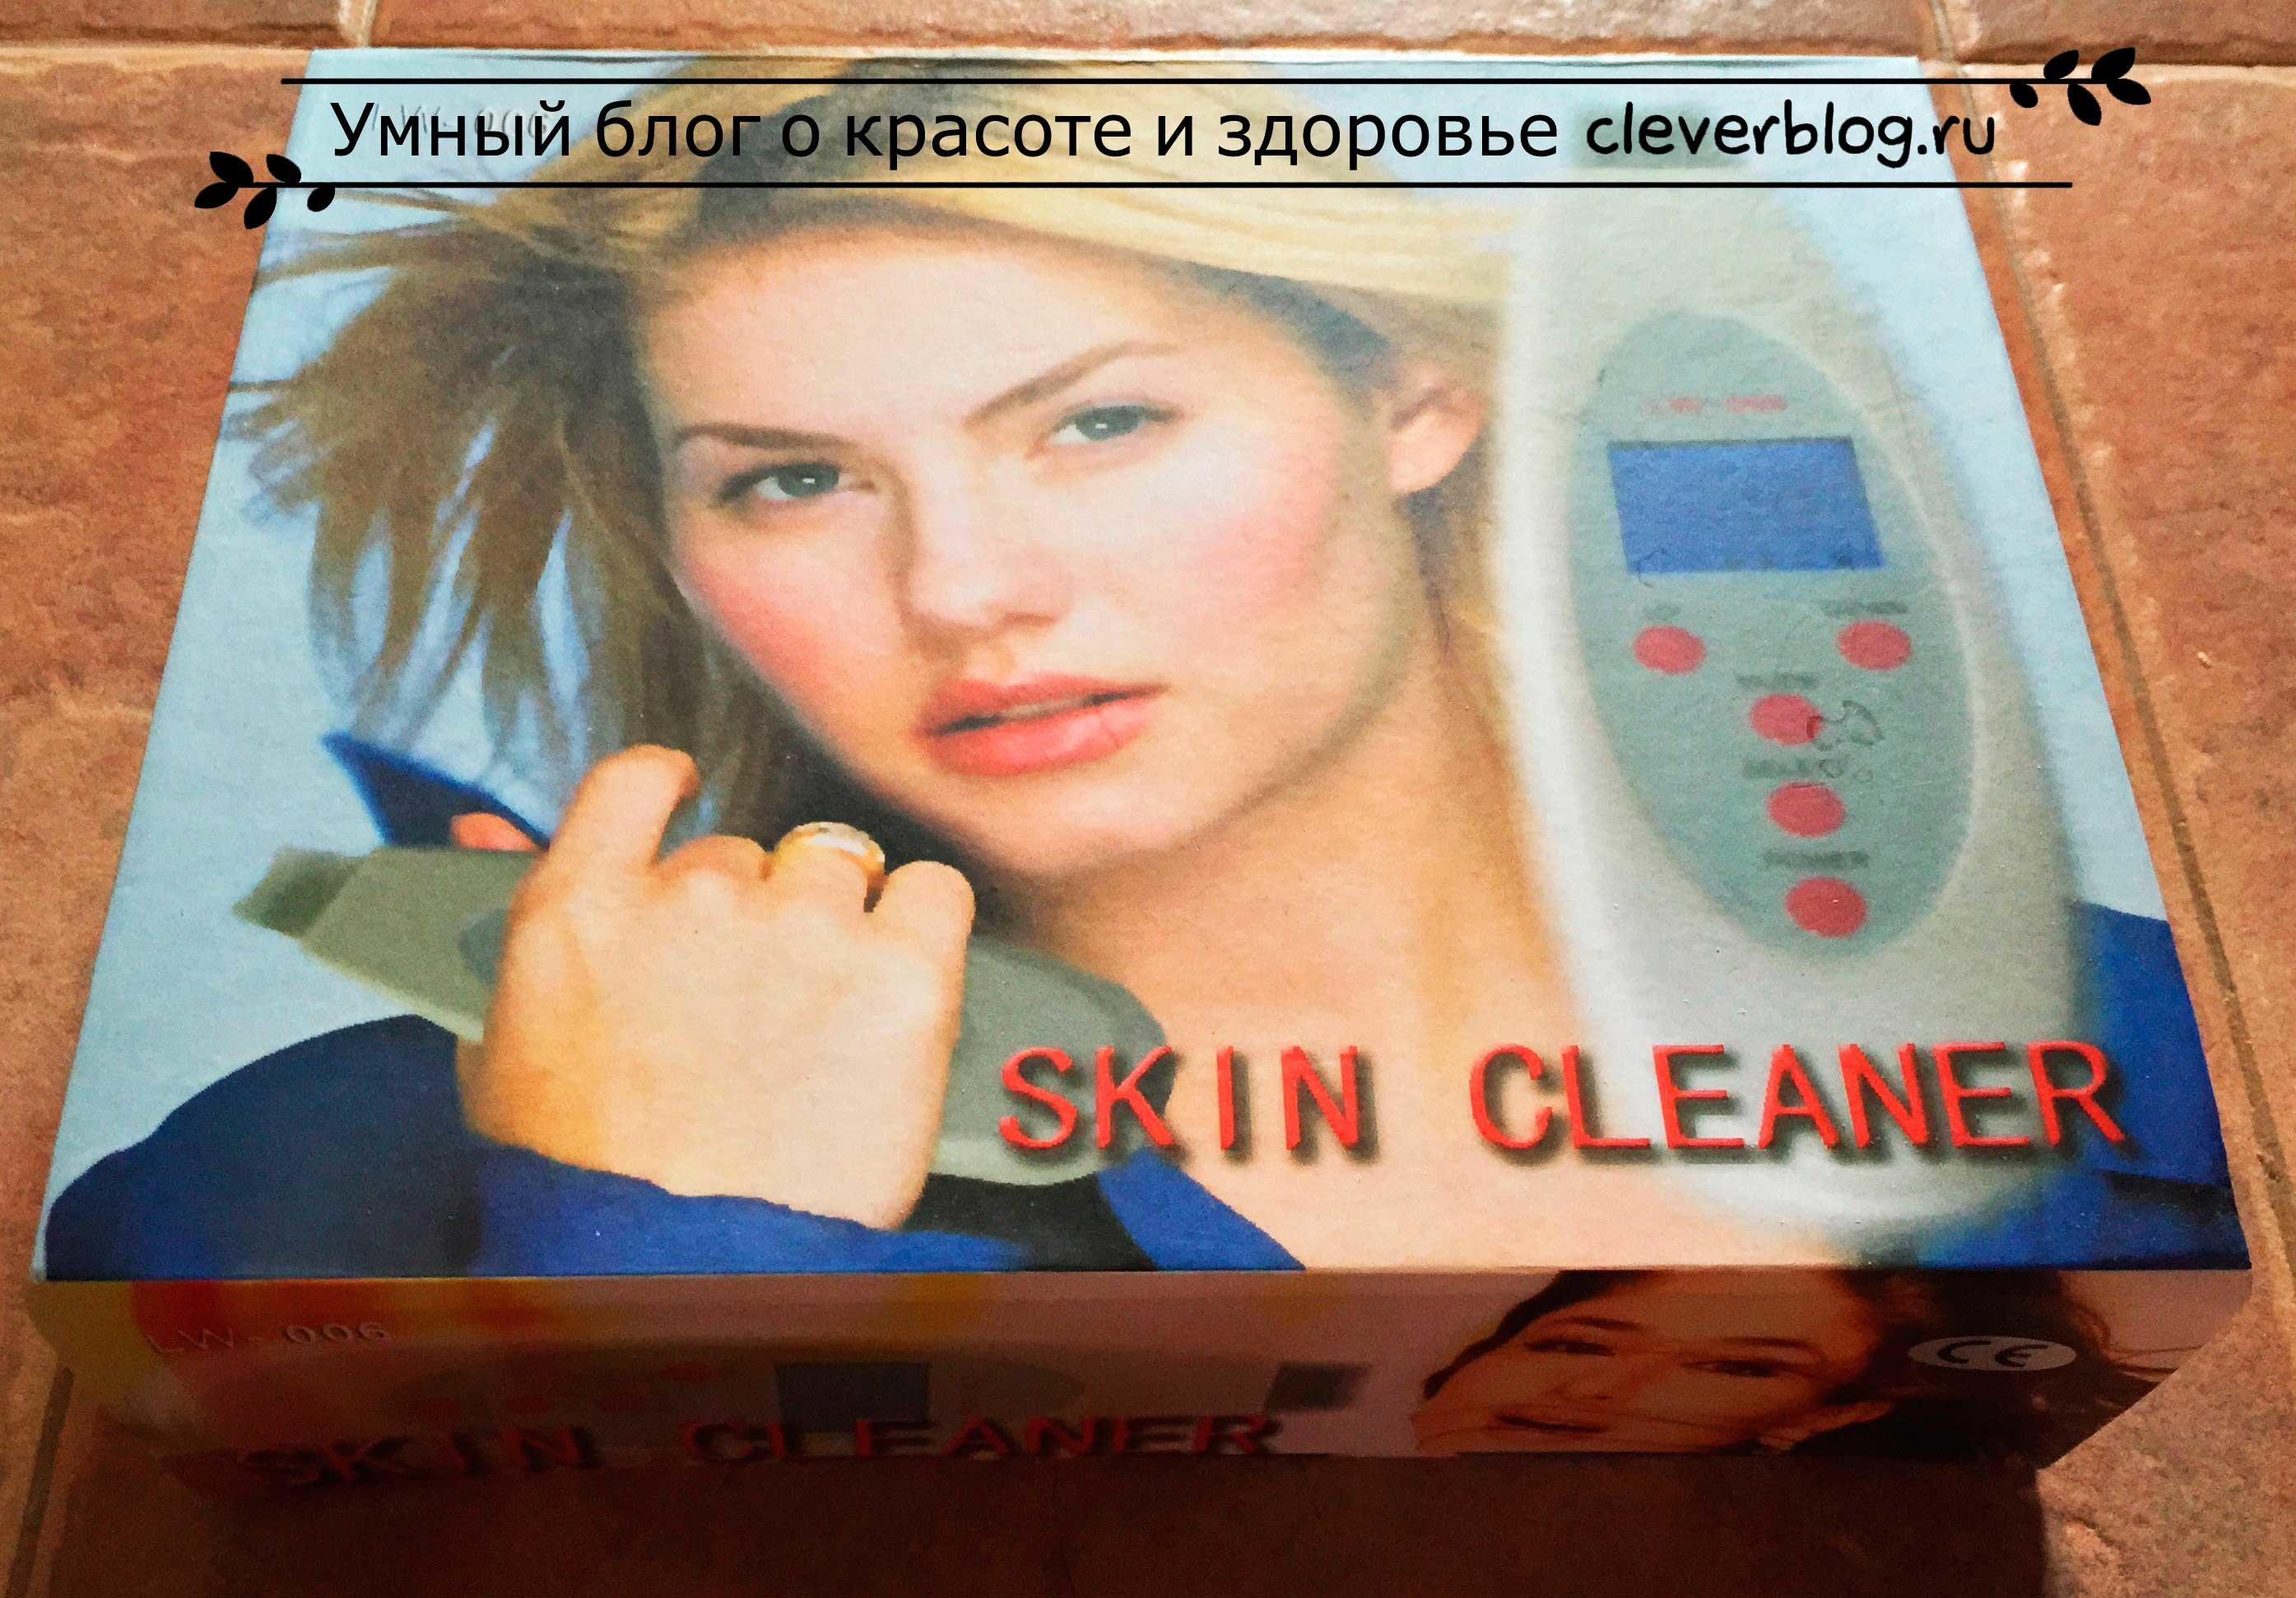 Ультразвуковая чистка лица lw 006. www.cleverblog.ru